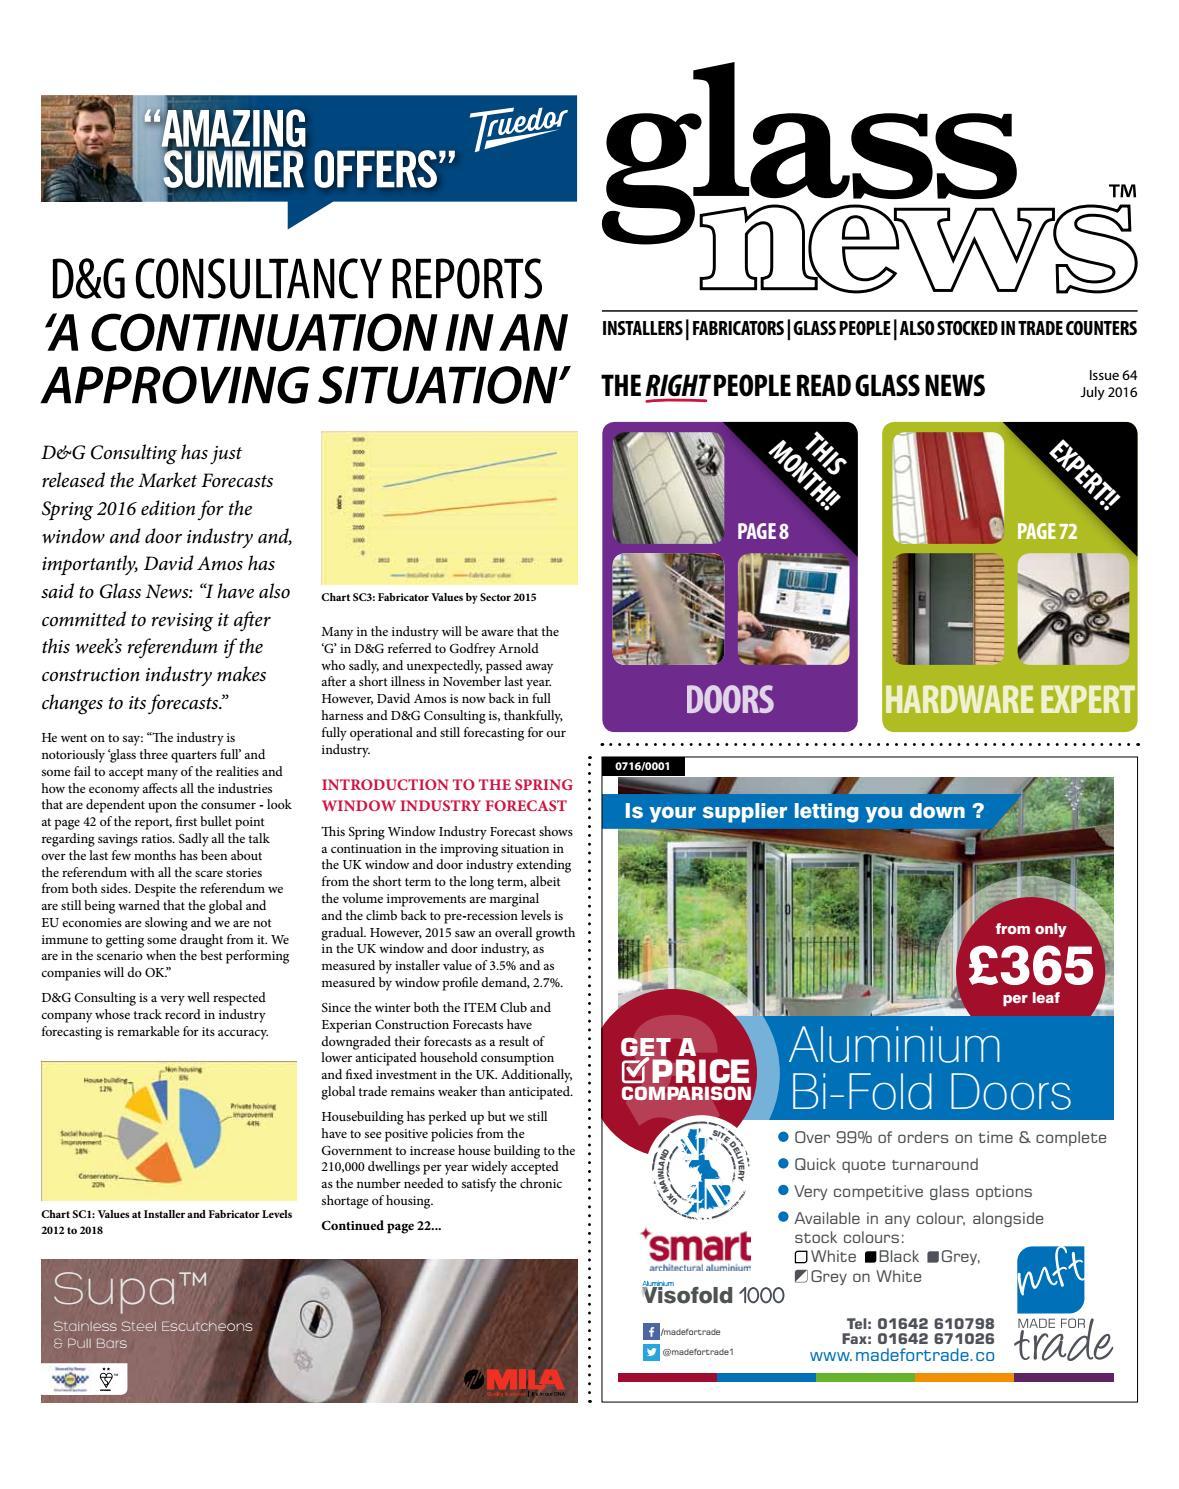 Glass News July 2016 by Christina Shaw - issuu